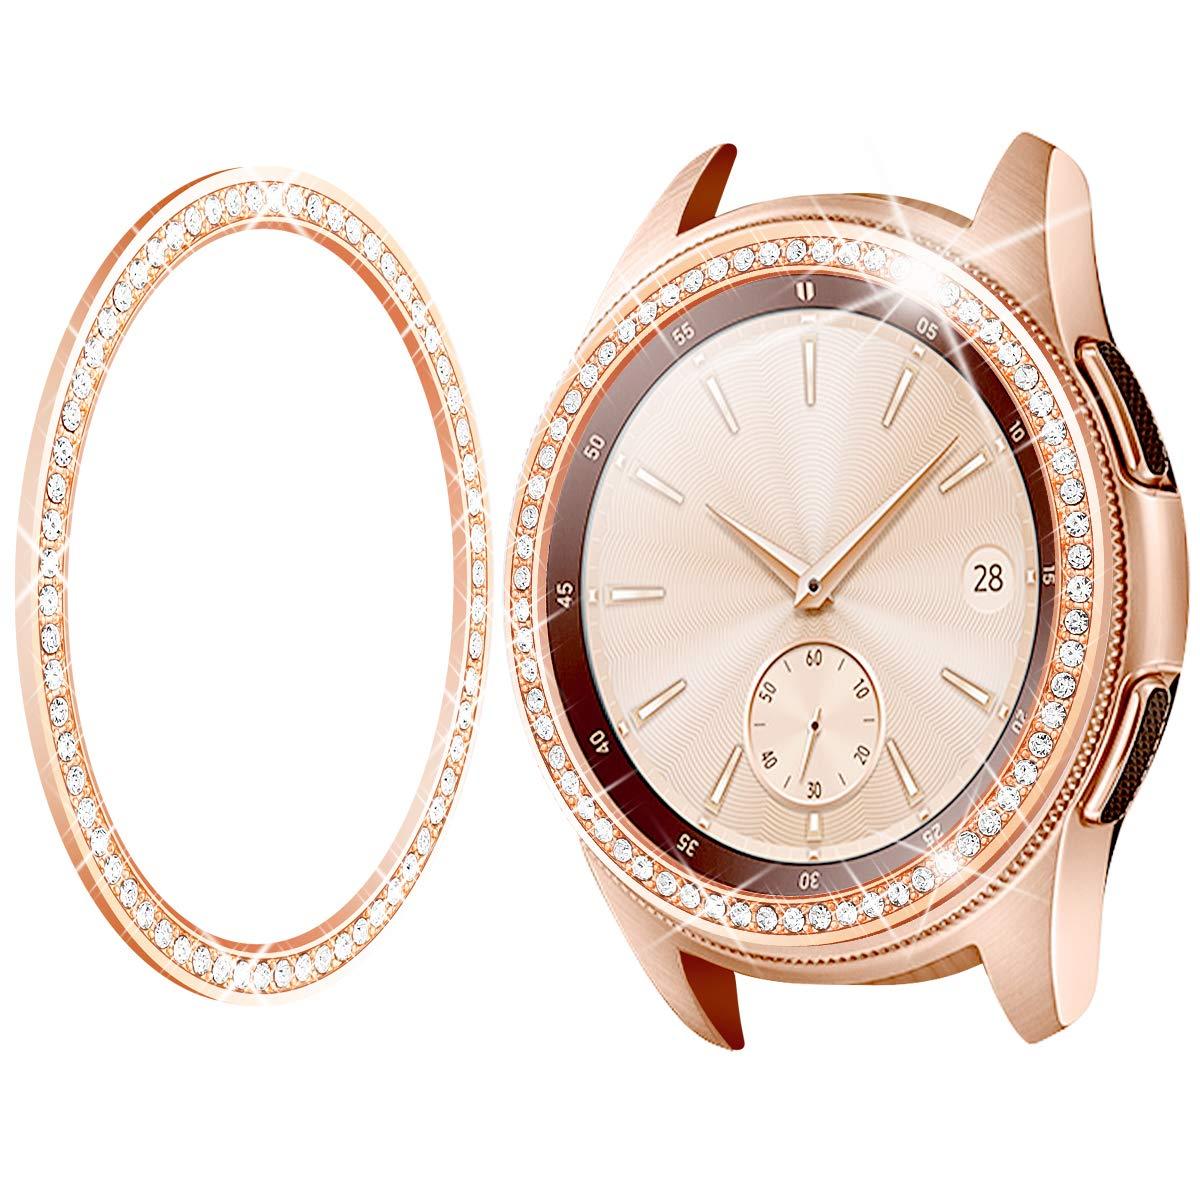 Goton Jewelry Bezel Ring Compatible Samsung Galaxy Watch 42mm Bezel, Gear Sport, Crystal Bling Diamond Women Men Watch Bezel Cover Protector (42mm, Rose Gold) by Goton